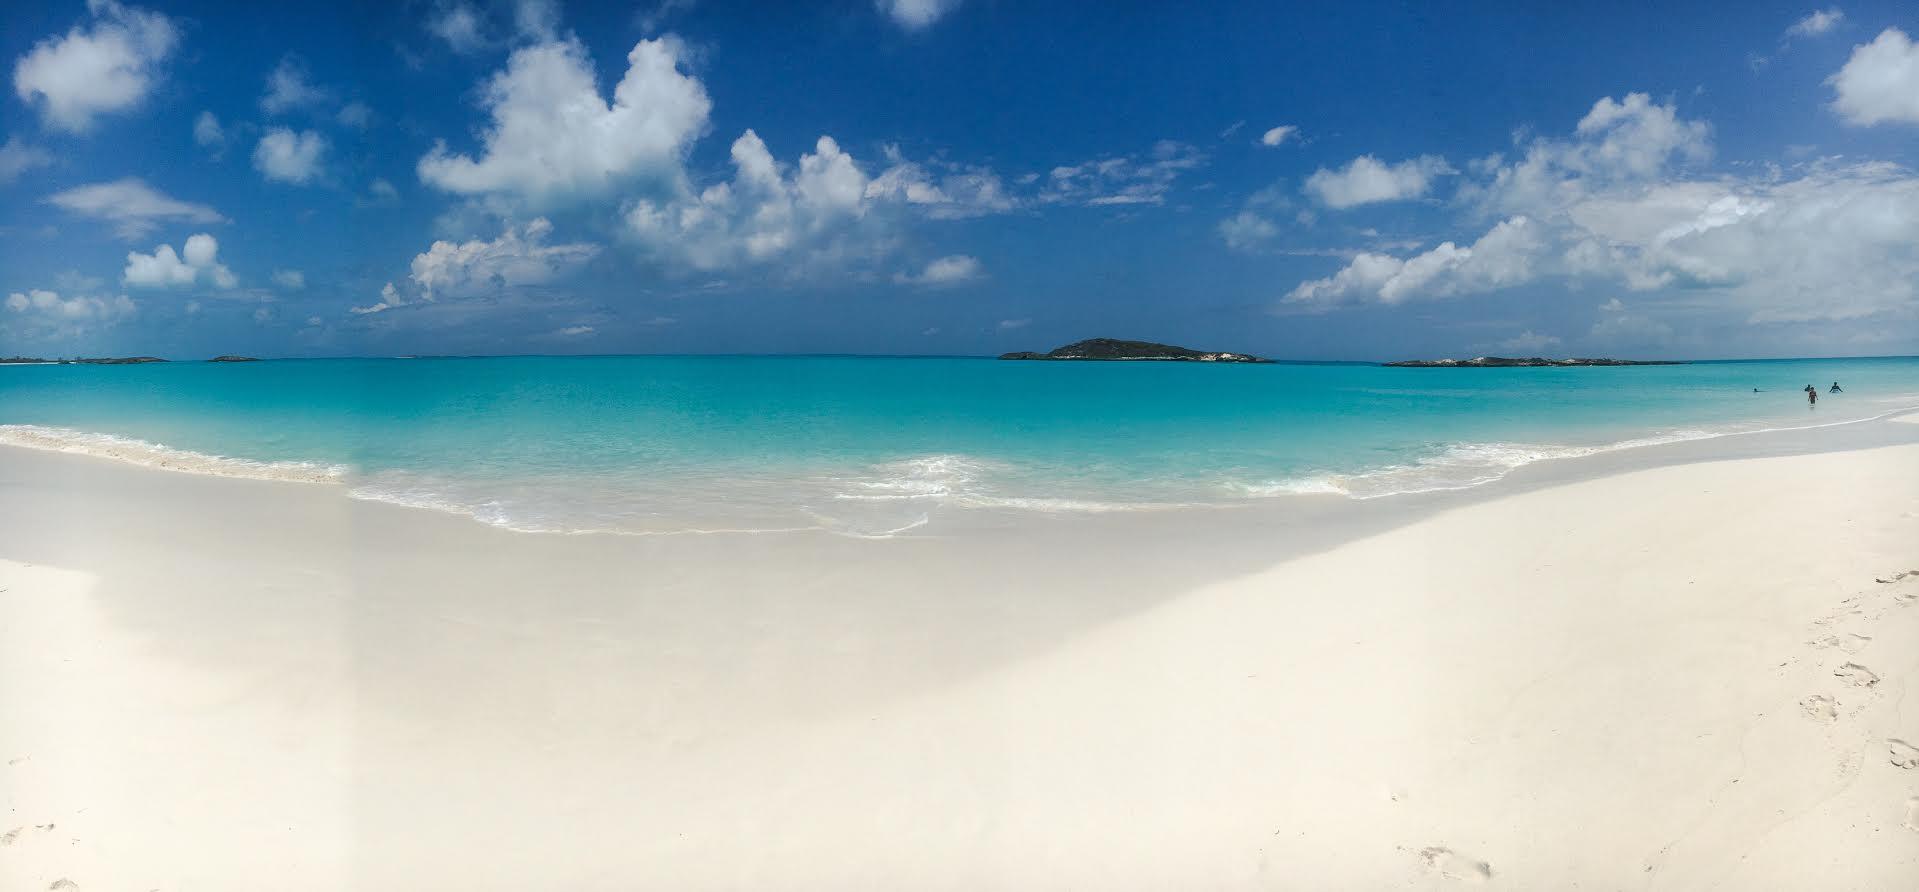 Tropic of Cancer Beach4.jpg